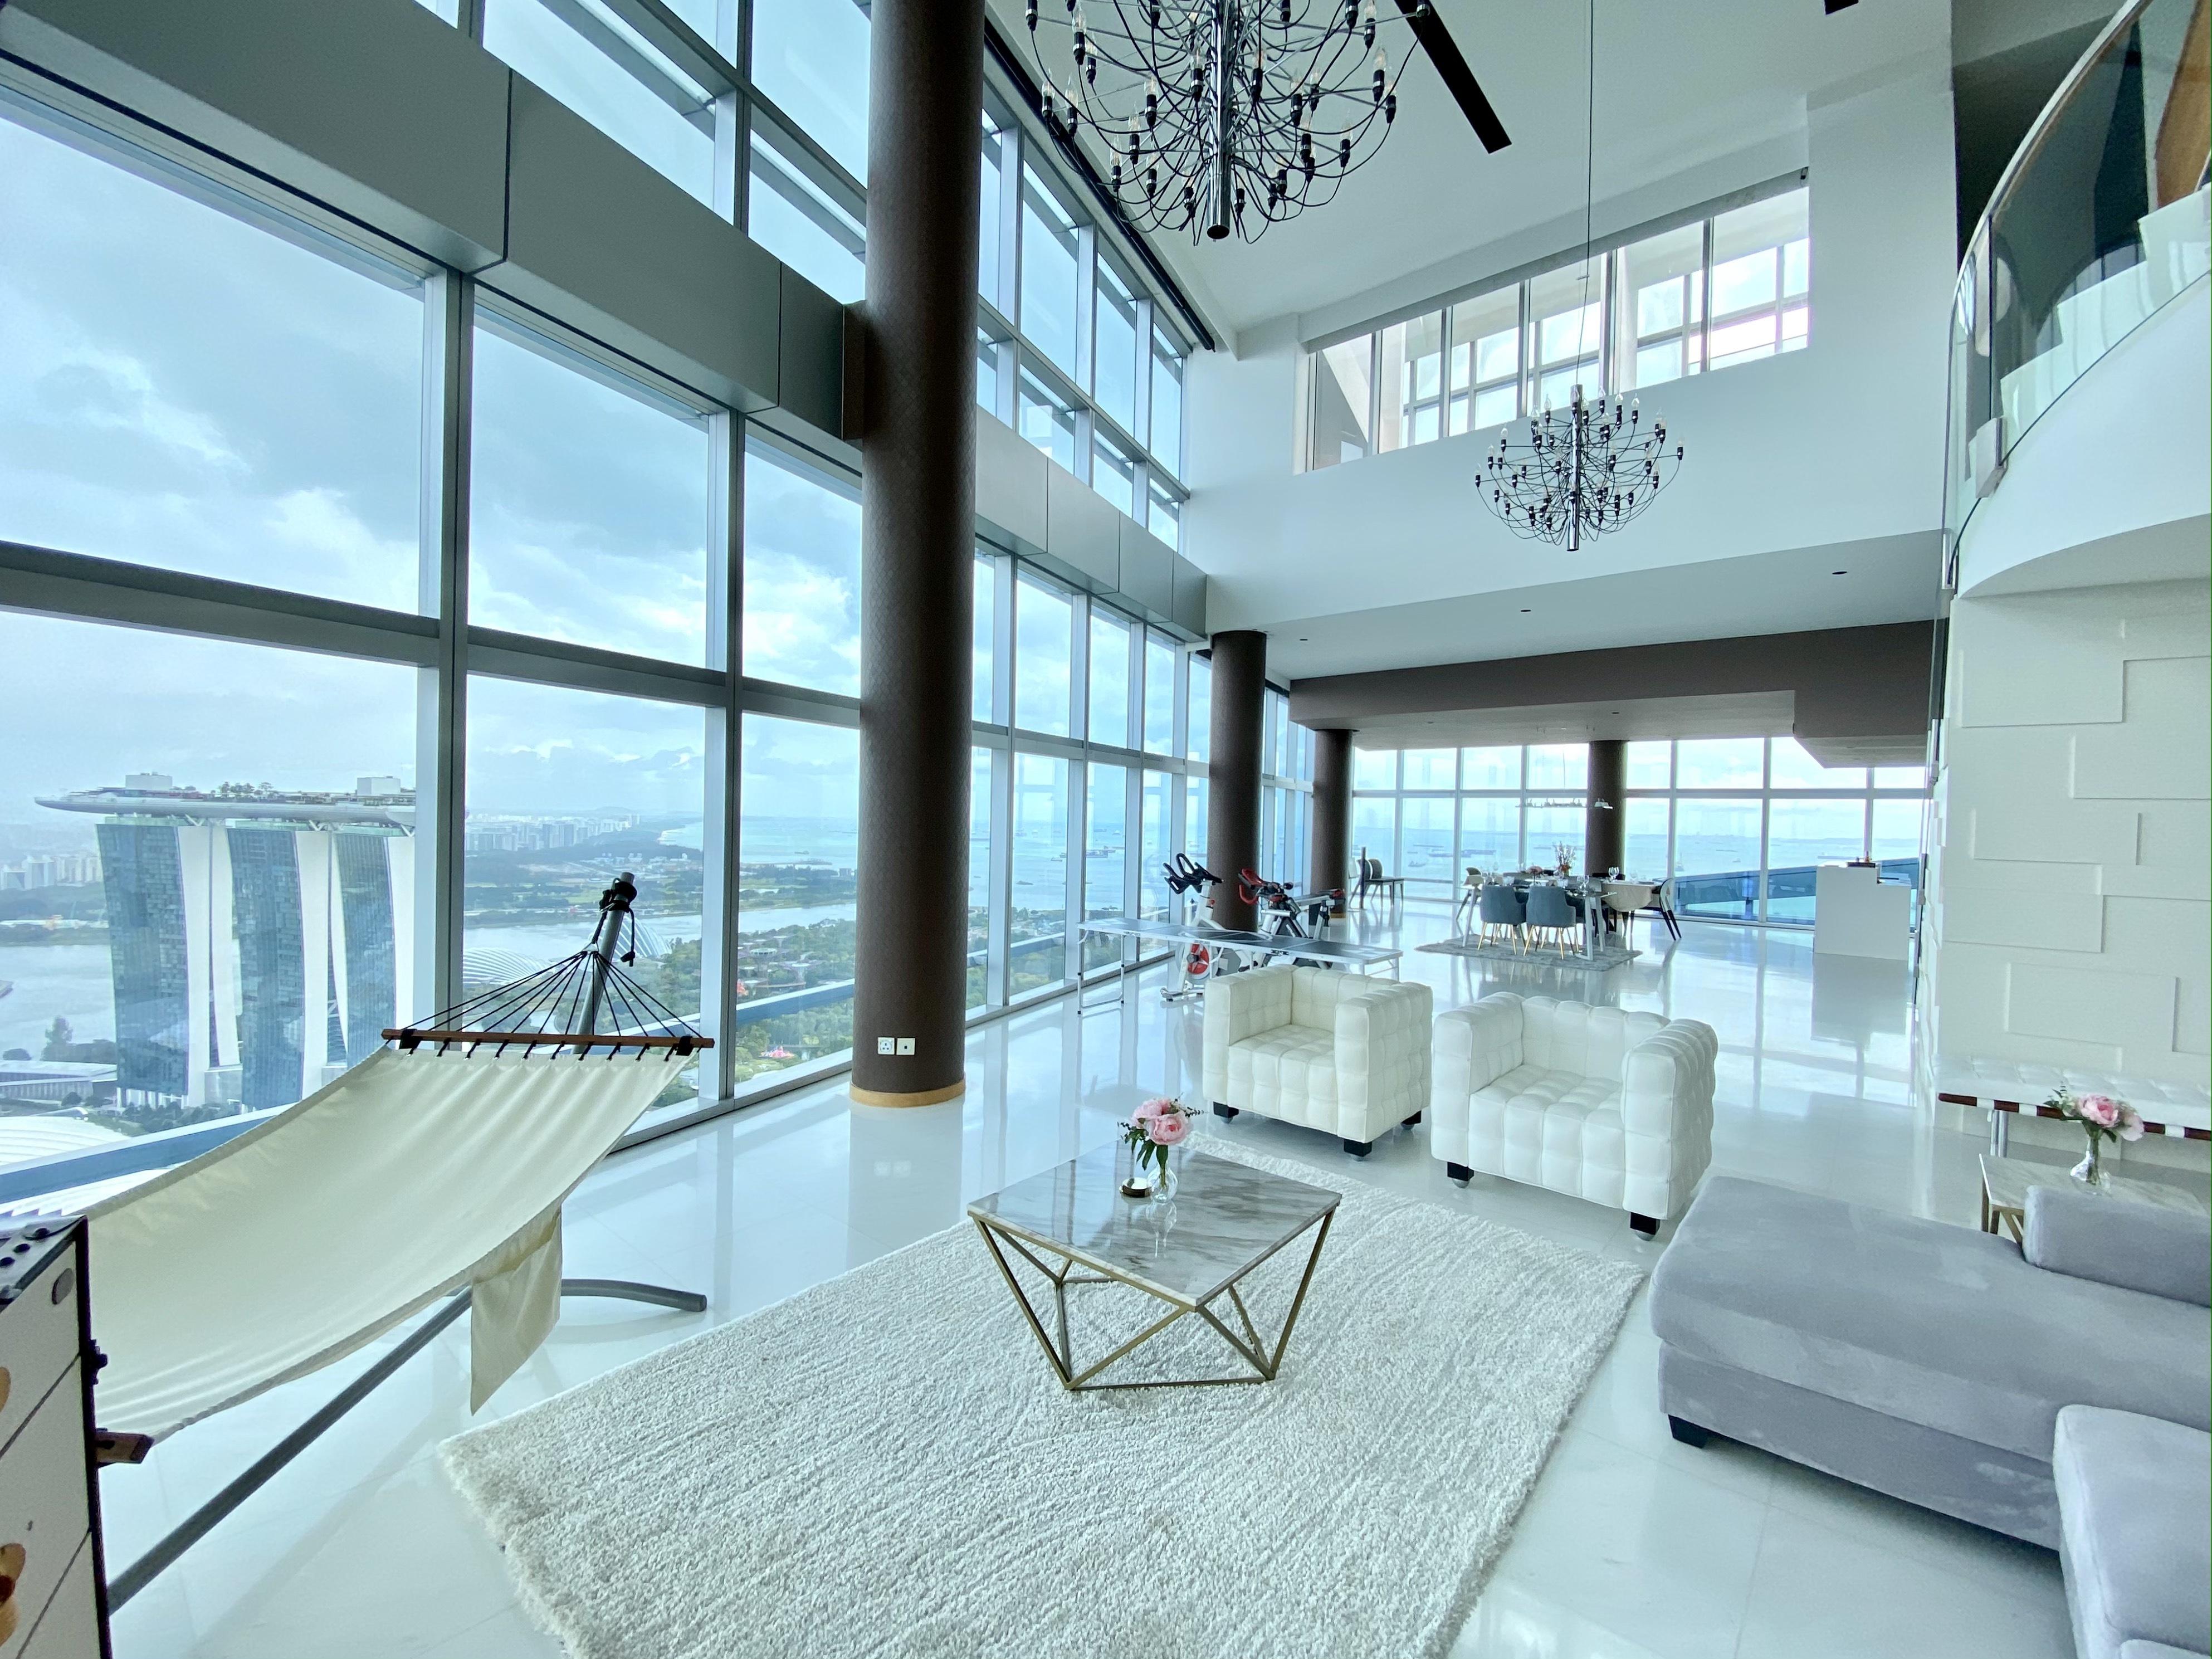 MBS View SKY VILLA GCB BUNGALOW 28,258 sqft 25m Rooftop Pool 24 Bedrooms Marina Bay Orchard Sentosa #128881371